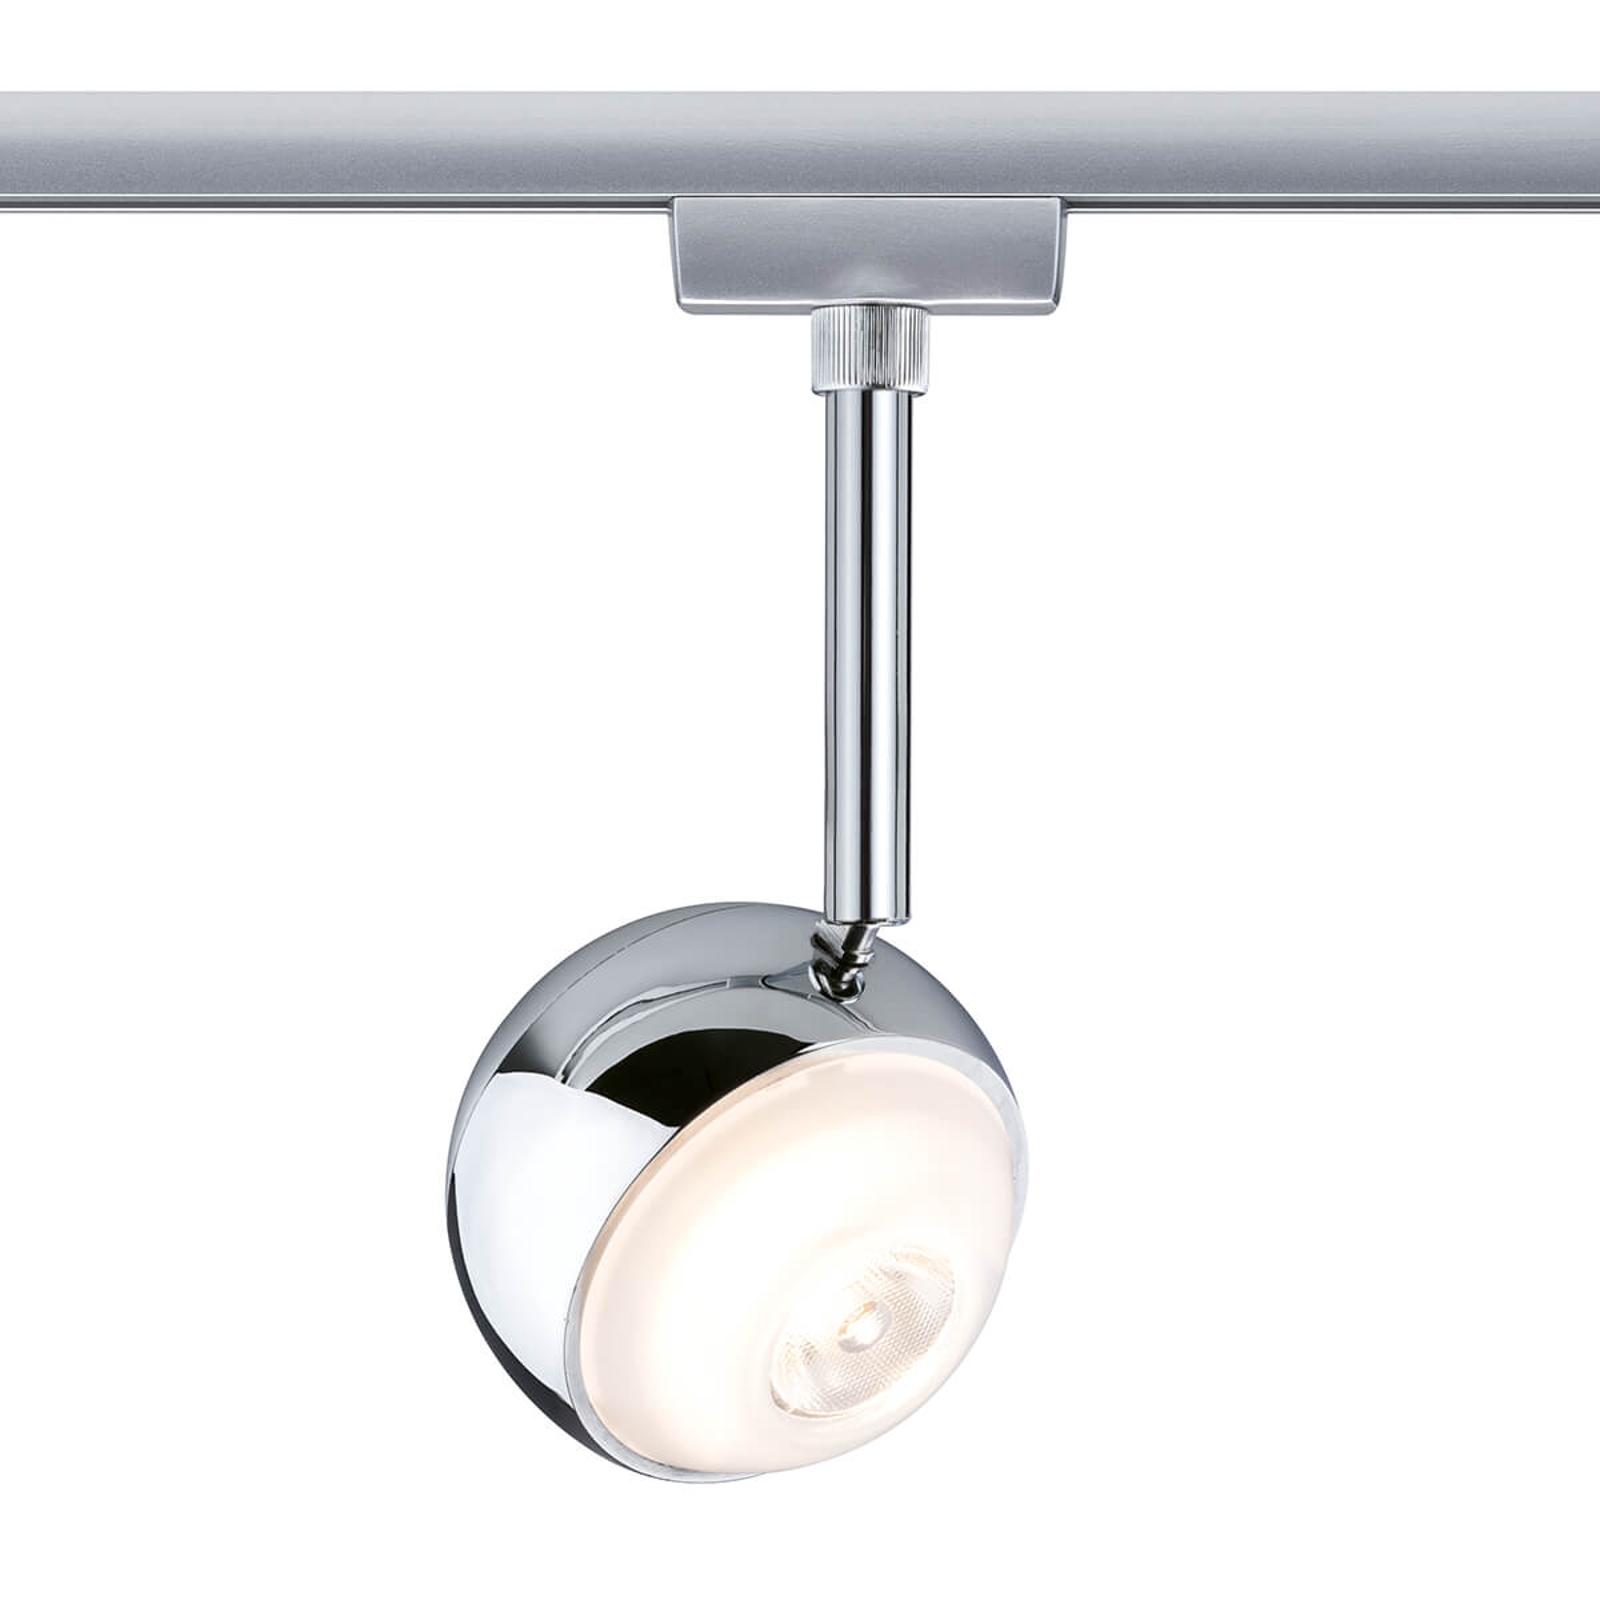 Paulmann URail Capsule II spot LED, chrom matowy